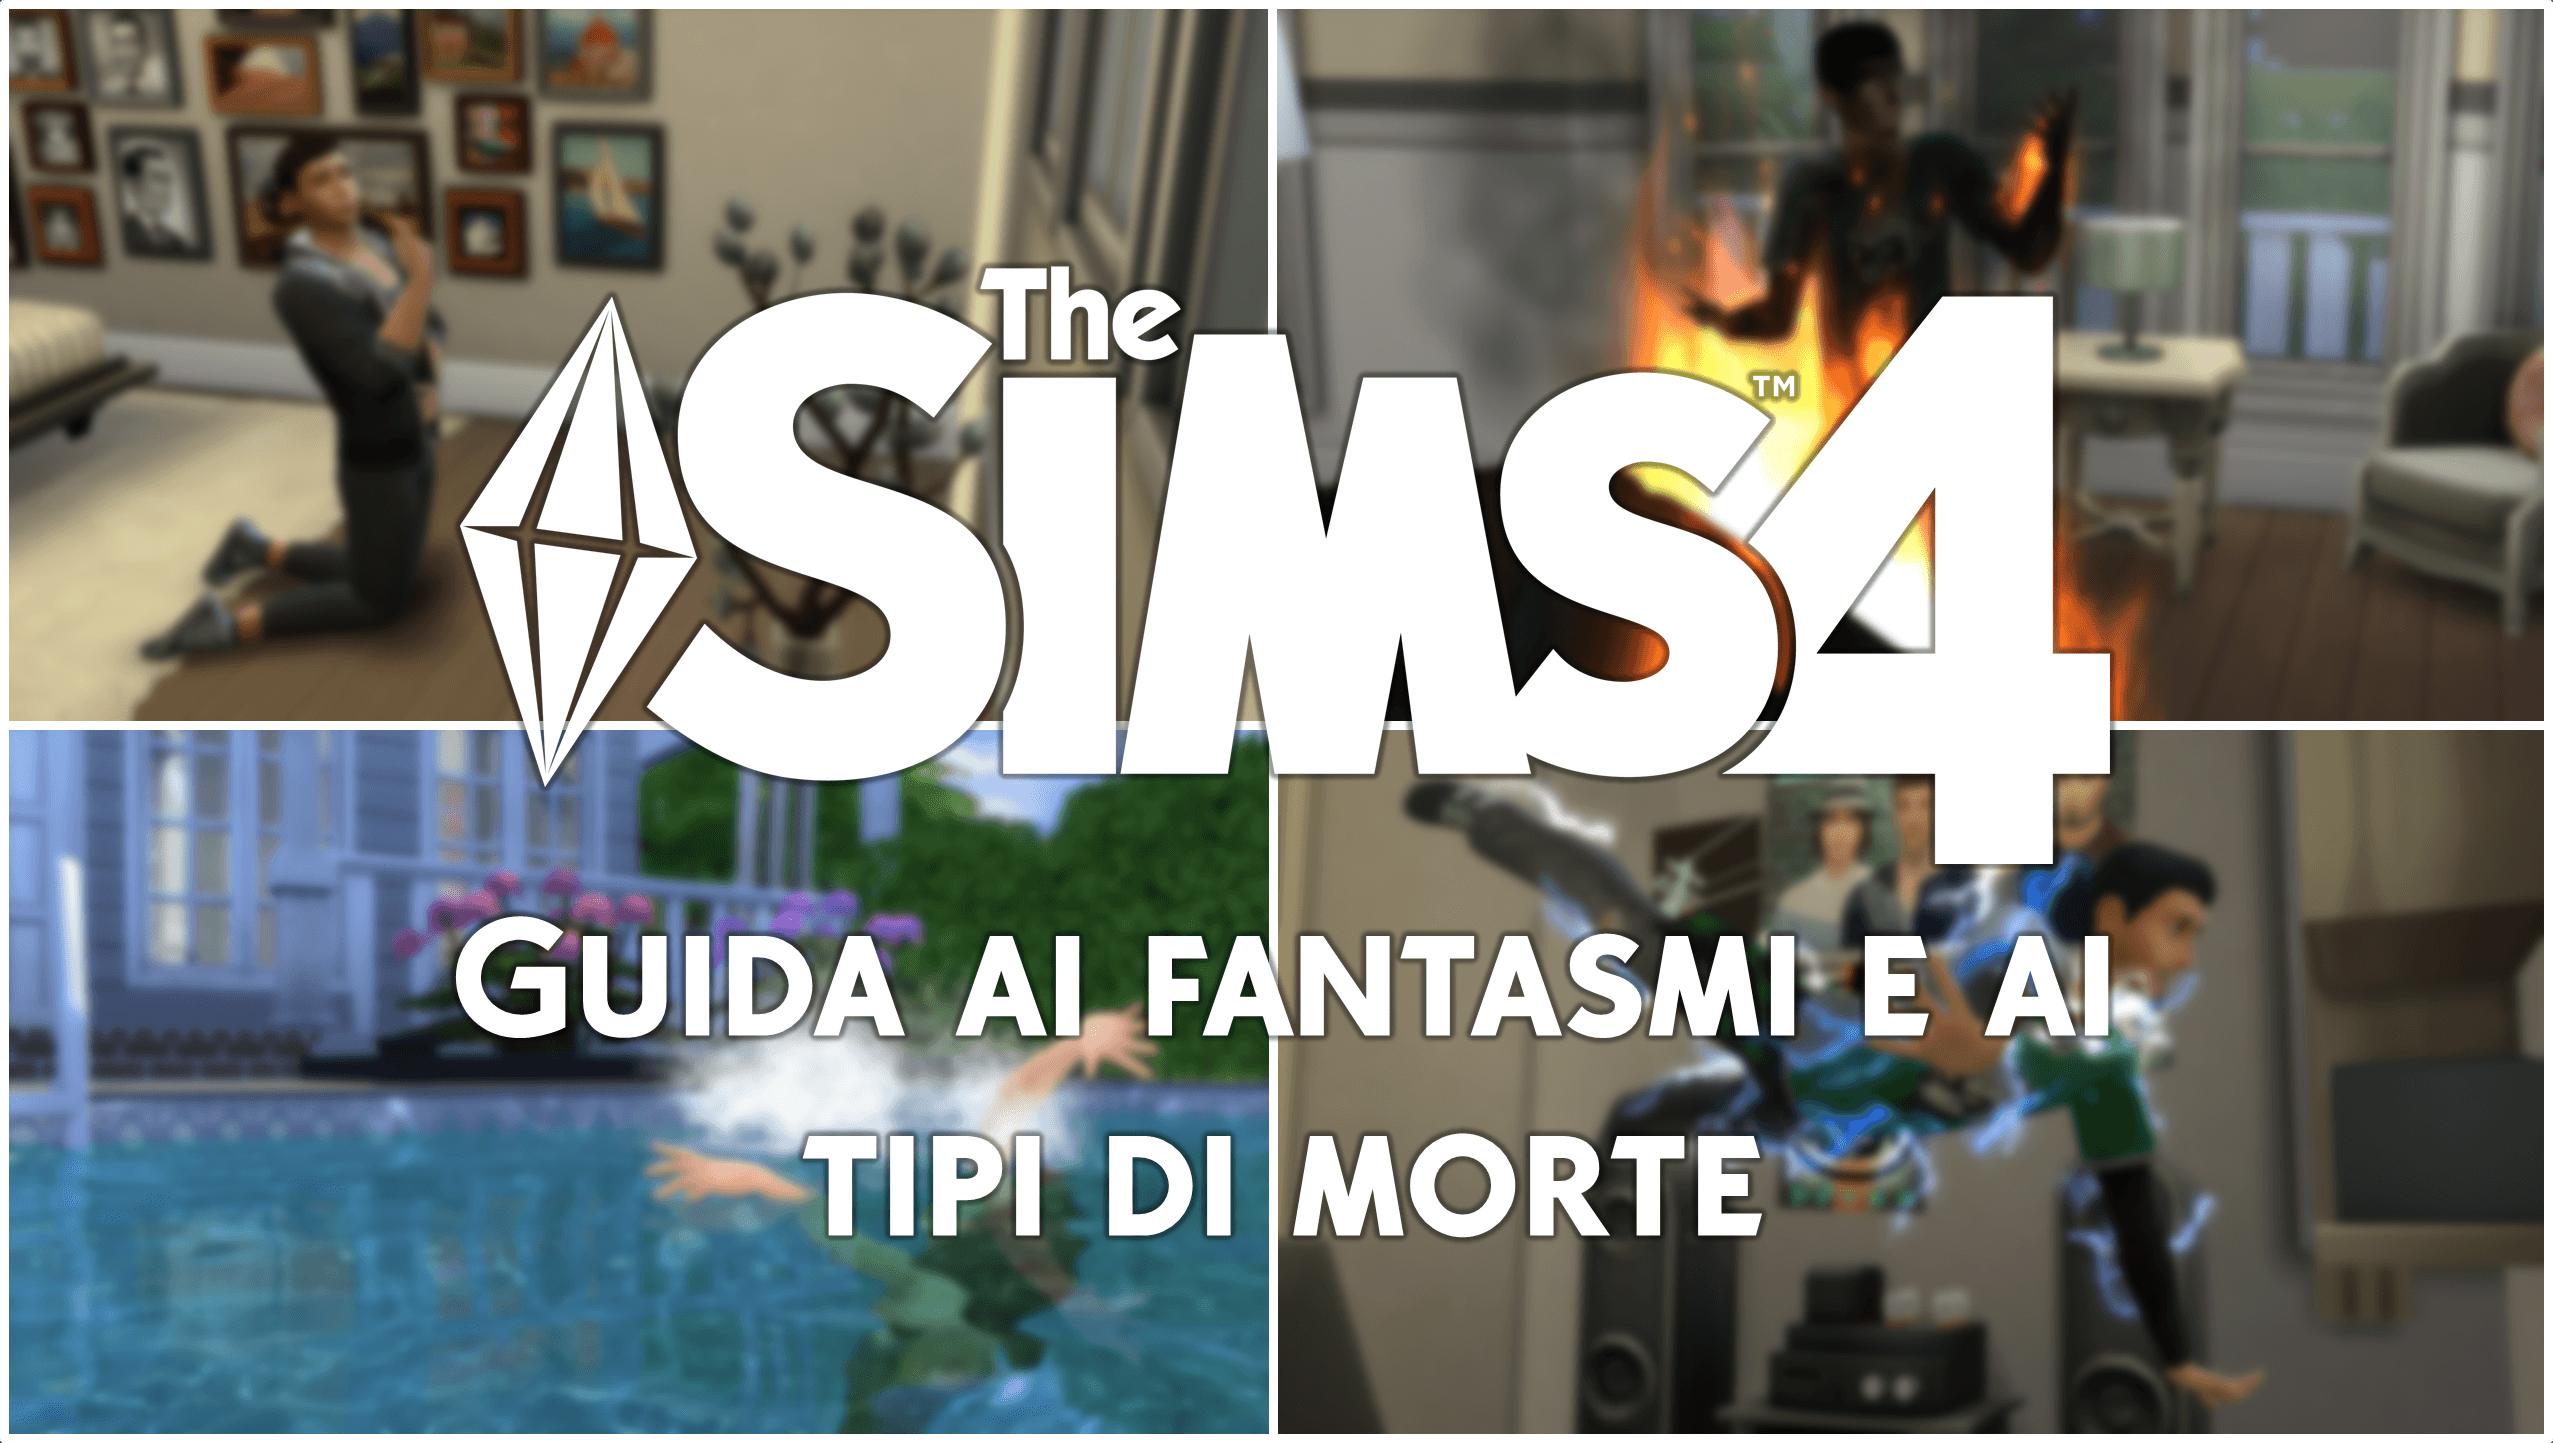 Vasca Da Bagno The Sims Mobile : The sims 4 guida ai fantasmi e ai tipi di morte simsworld